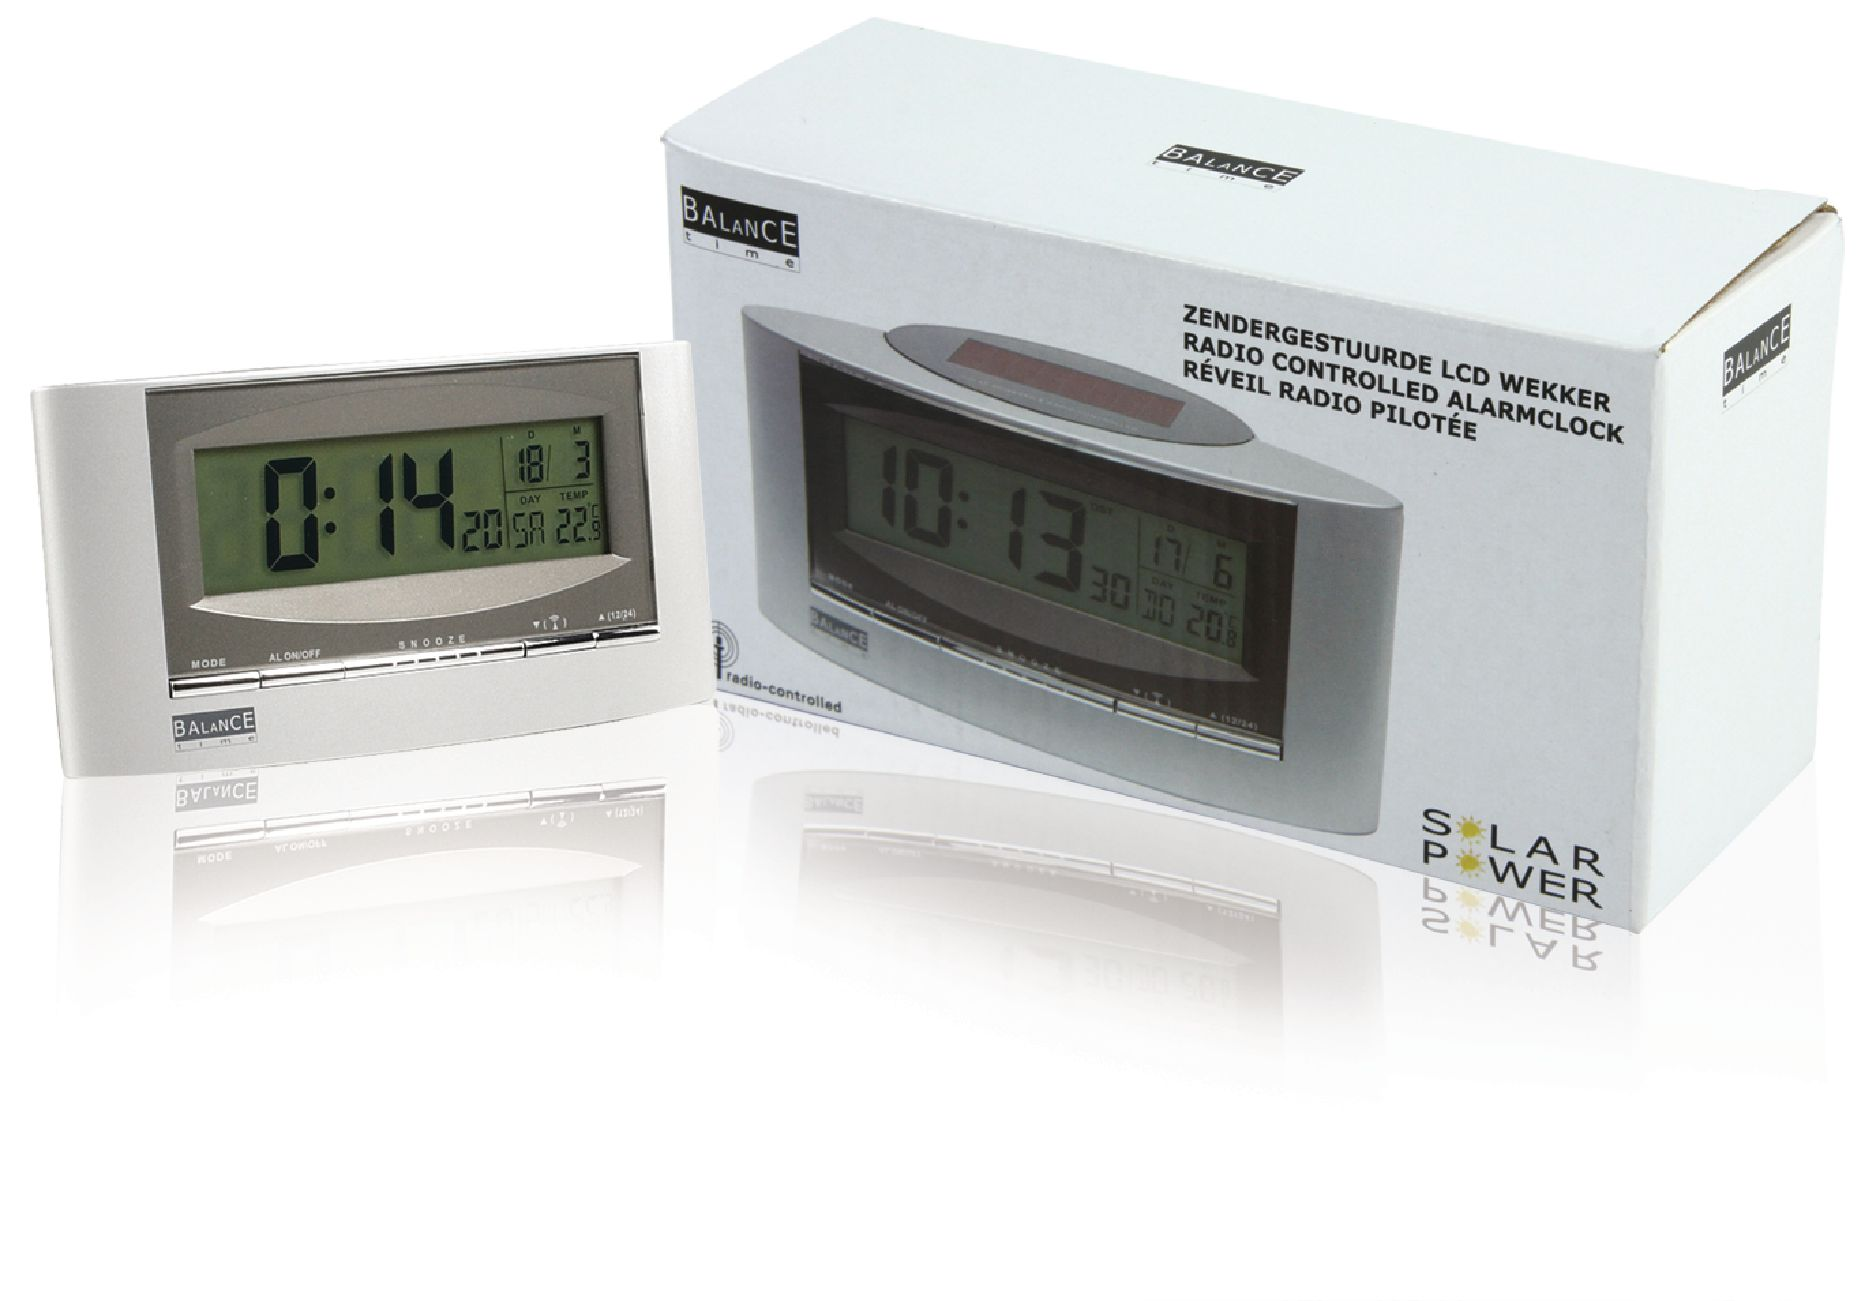 he clock 32 balance radio controlled solar alarm clock digital silver electronic. Black Bedroom Furniture Sets. Home Design Ideas